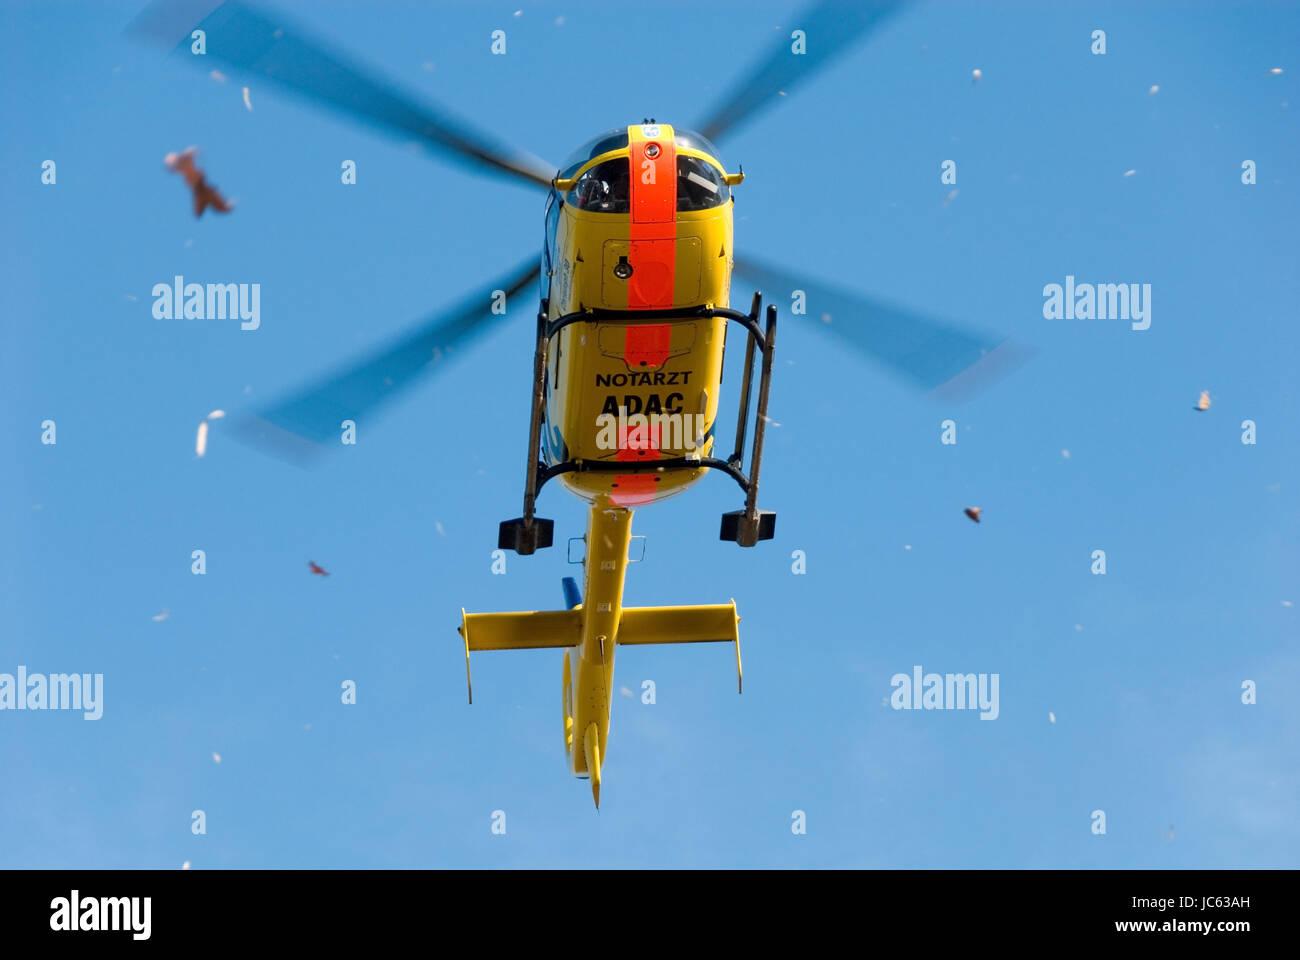 Germany, Lower Saxony, circle of Peine, Ilsede, helicopter, whirling foliage, Deutschland, Niedersachsen, Kreis - Stock Image